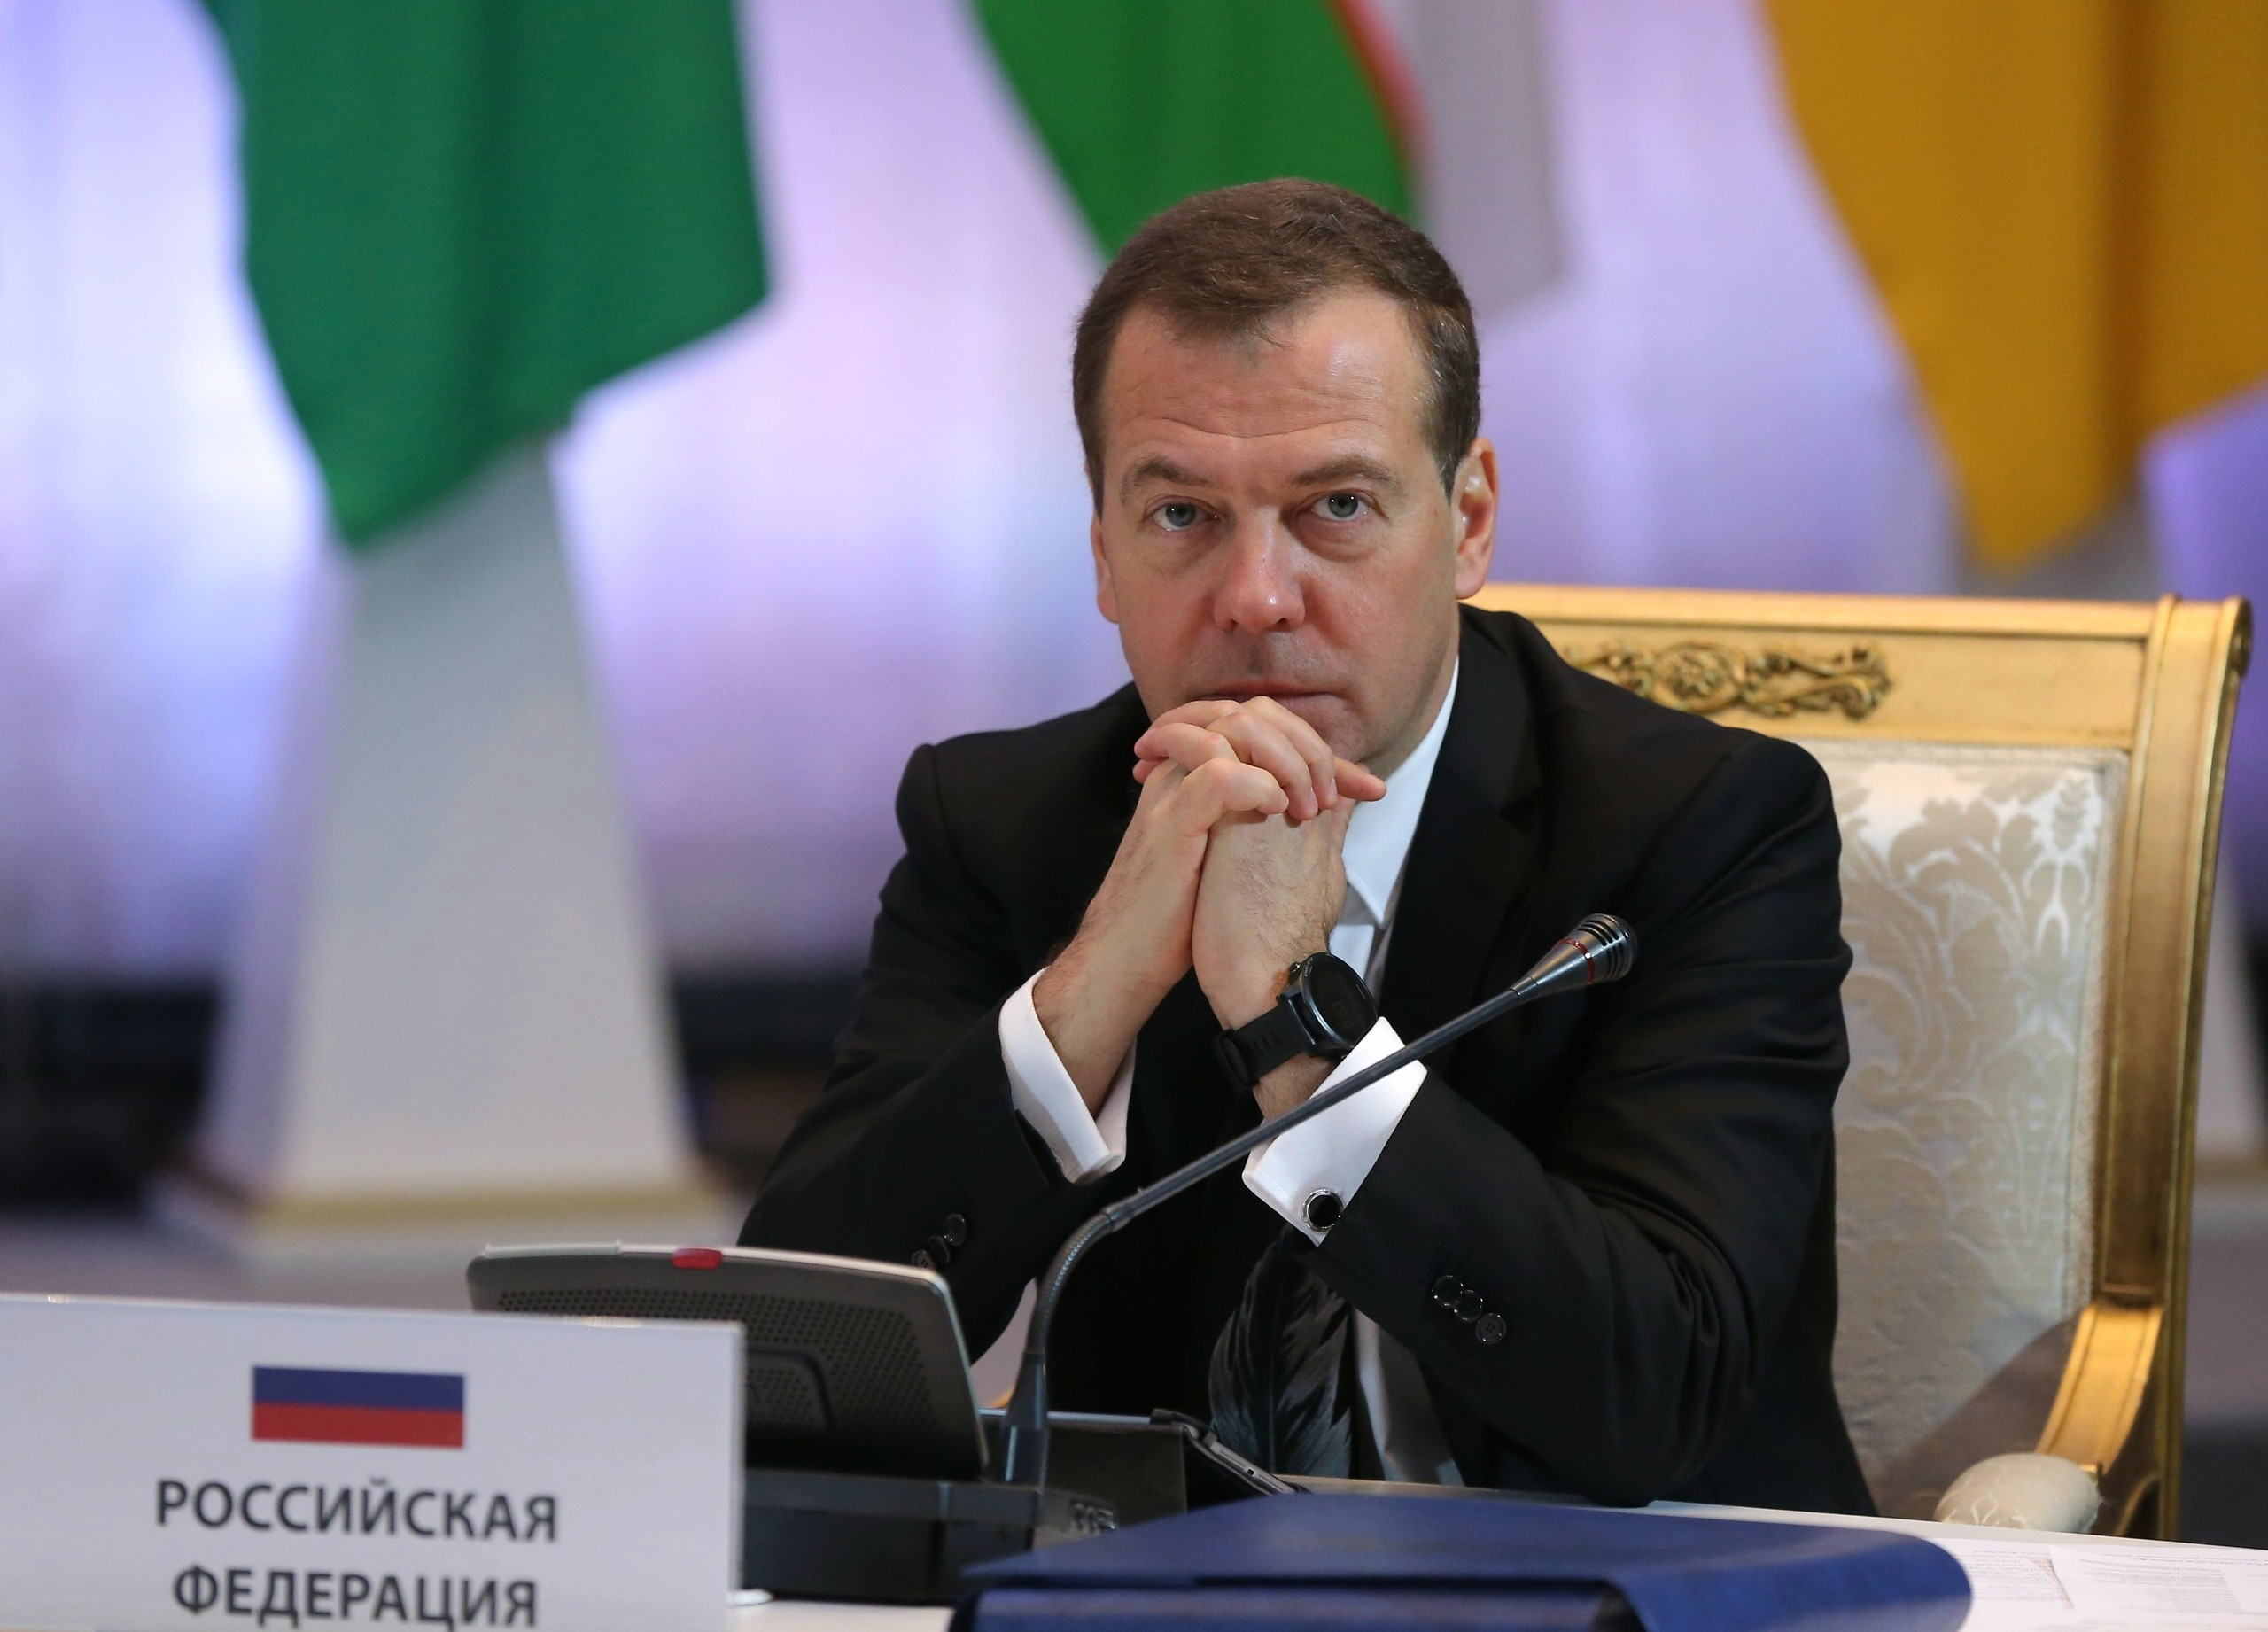 "<p>Фото: &copy; VK/<a href=""https://vk.com/dm"">Дмитрий Медведев</a></p>"